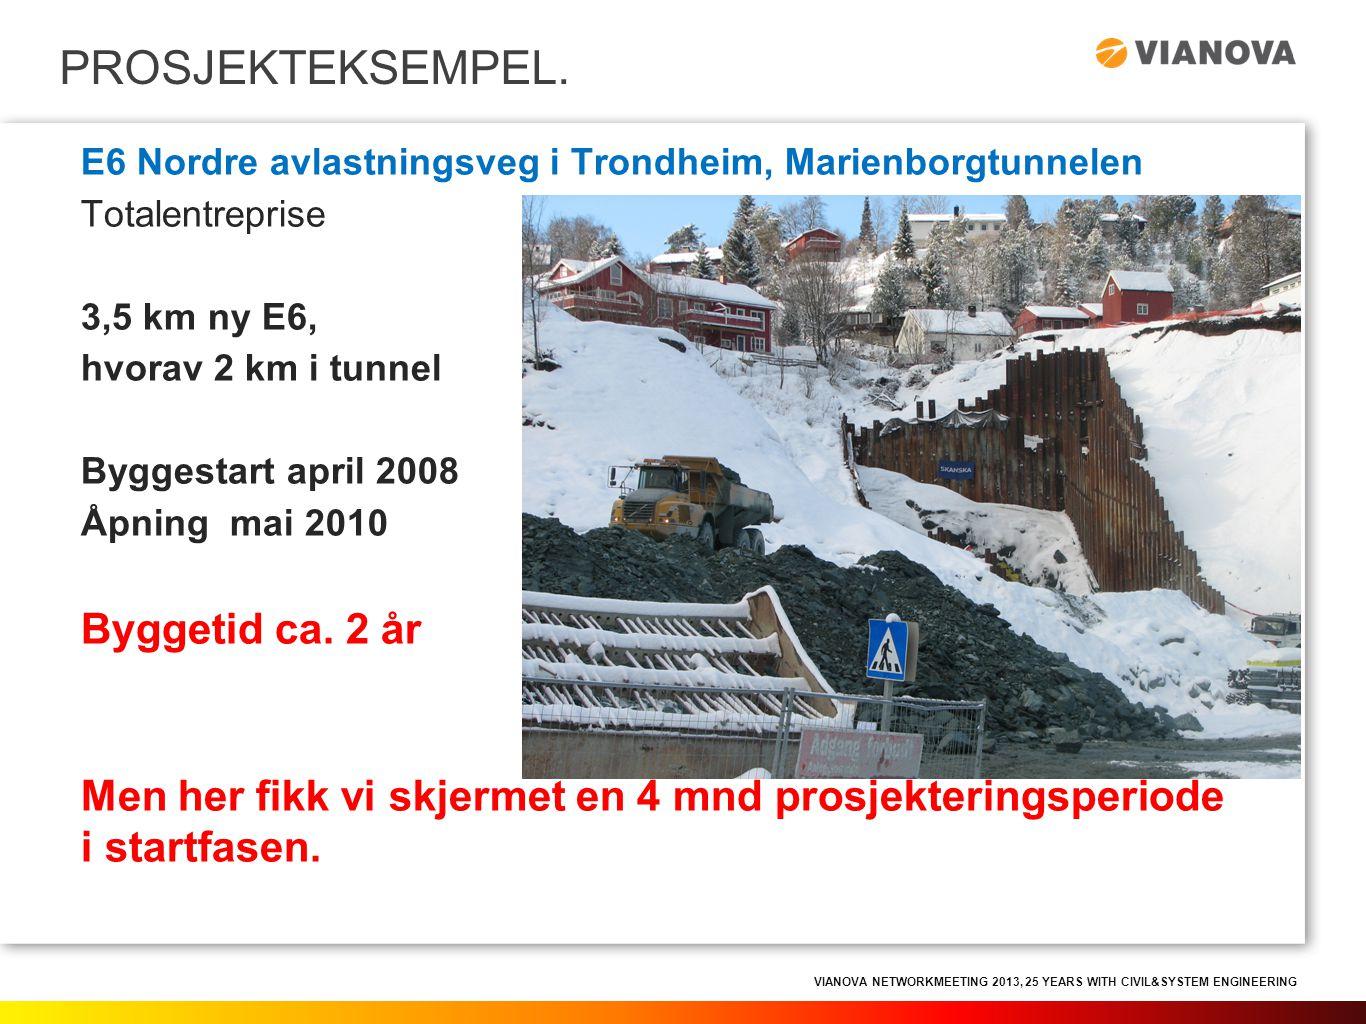 VIANOVA NETWORKMEETING 2013, 25 YEARS WITH CIVIL&SYSTEM ENGINEERING PROSJEKTEKSEMPEL. E6 Nordre avlastningsveg i Trondheim, Marienborgtunnelen Totalen